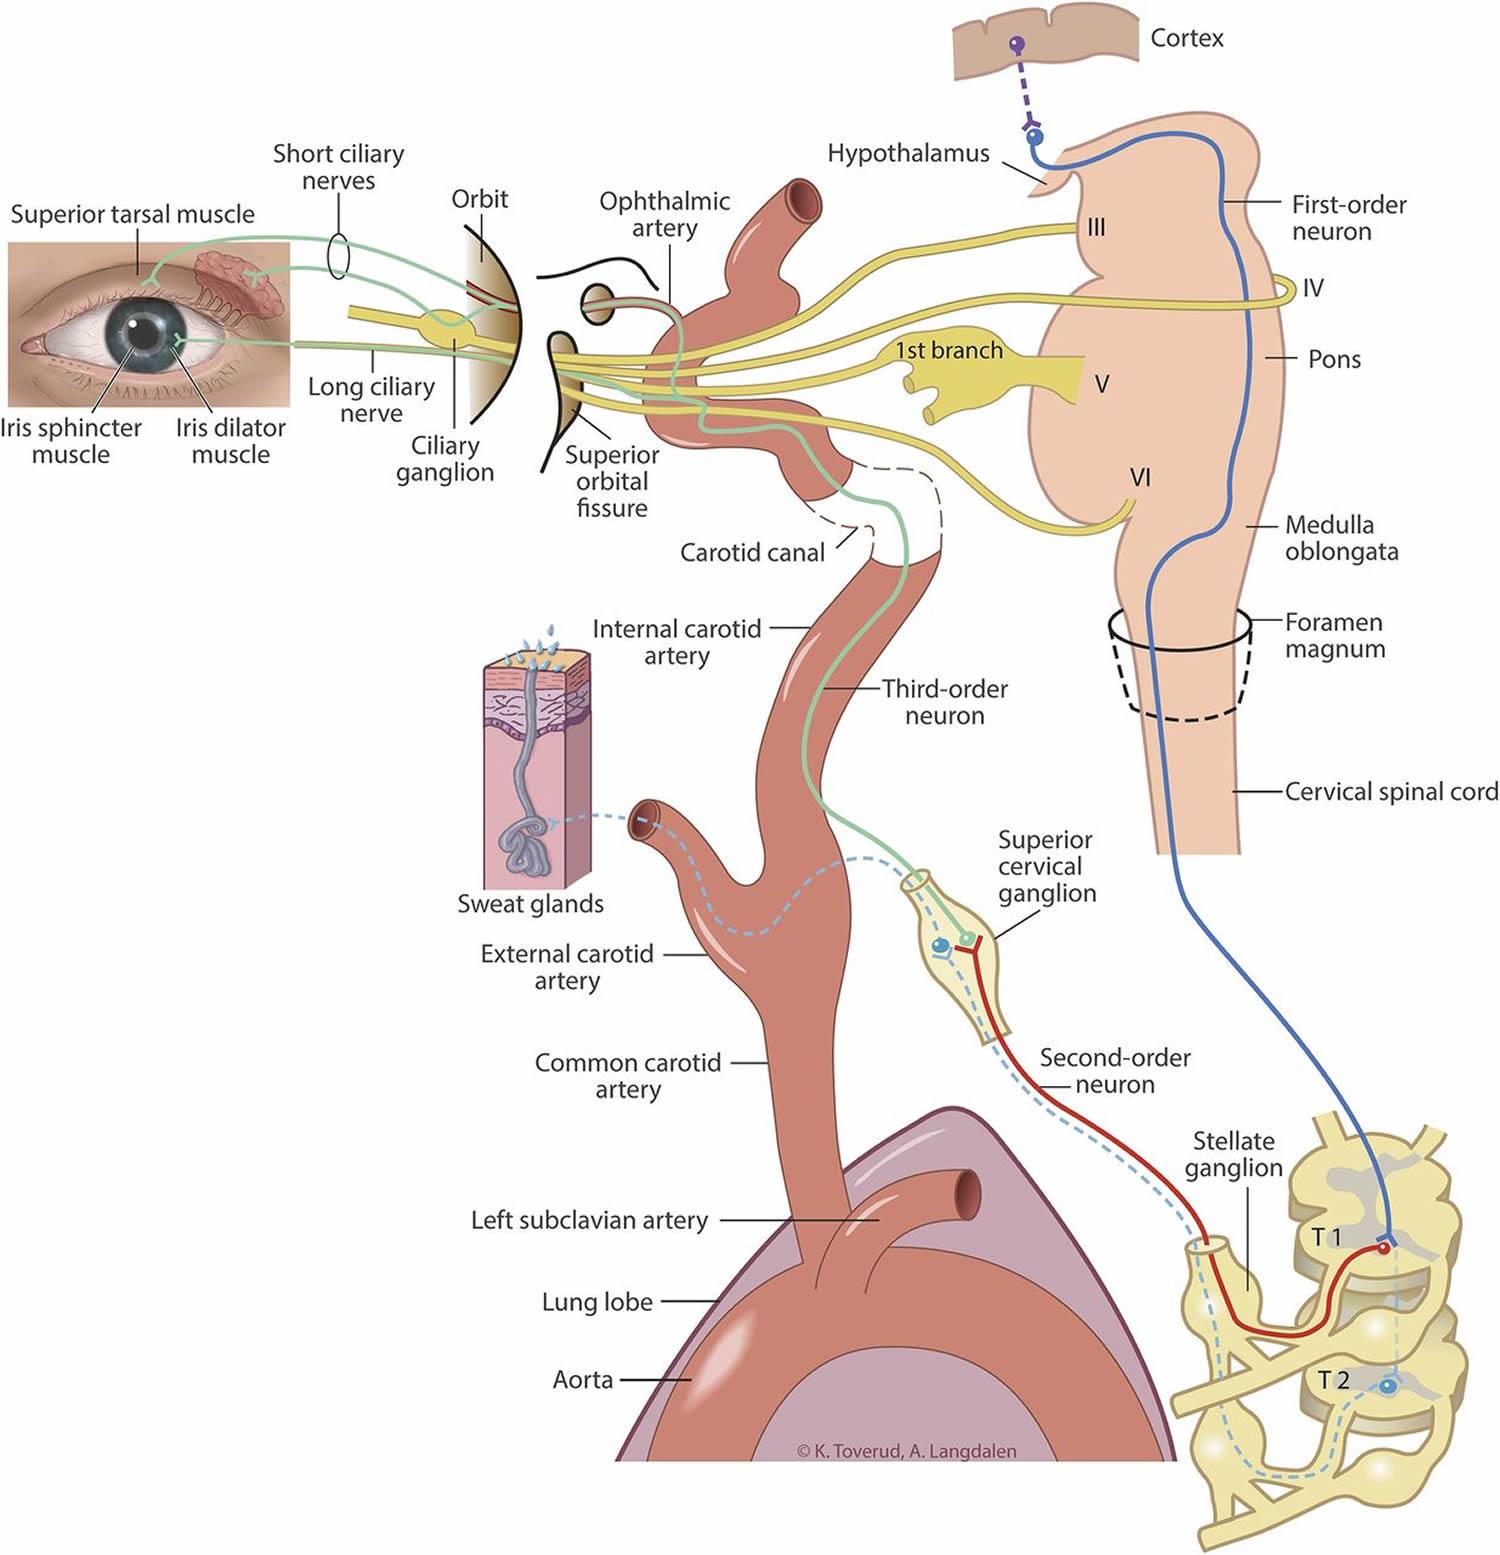 horner's syndrome sympathetic nerves